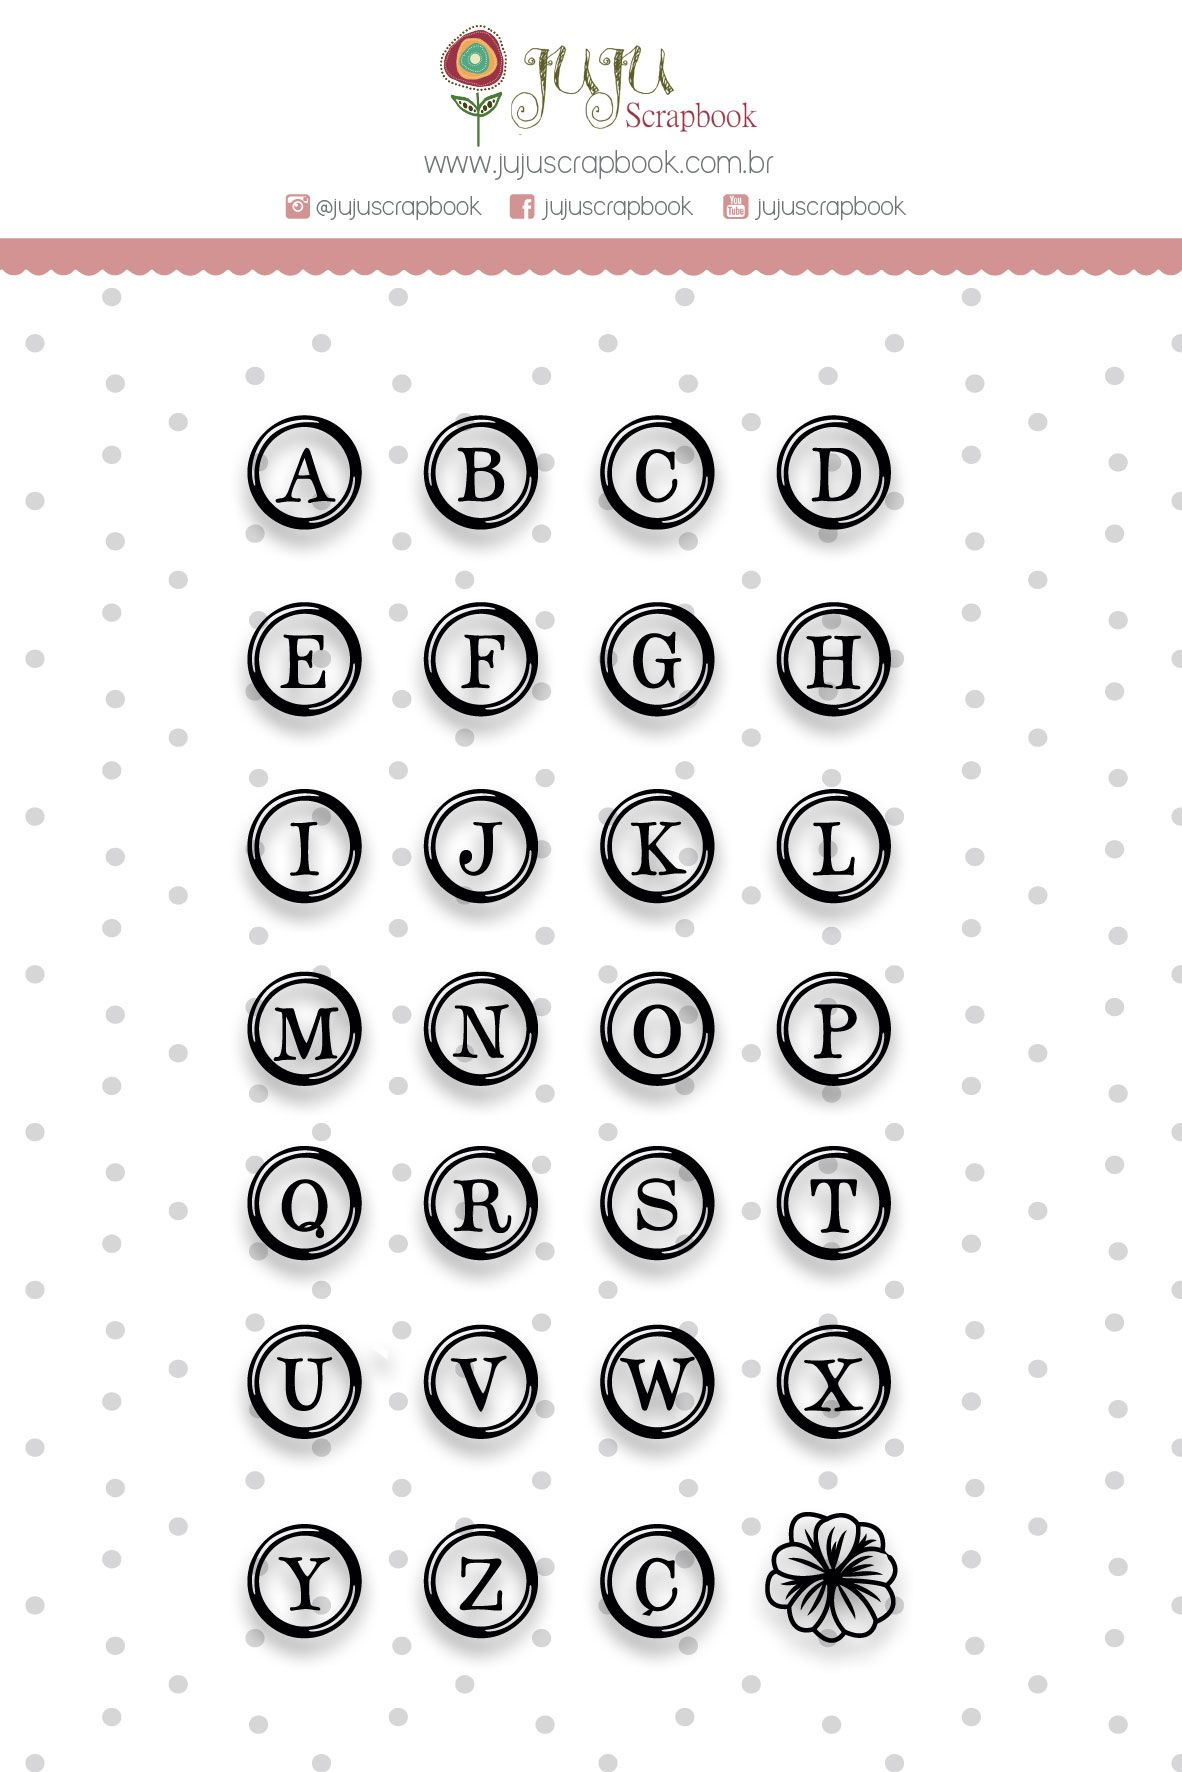 Carimbo Alfabeto Redondo - Coleção Shabby Dreams - JuJu Scrapbook  - JuJu Scrapbook